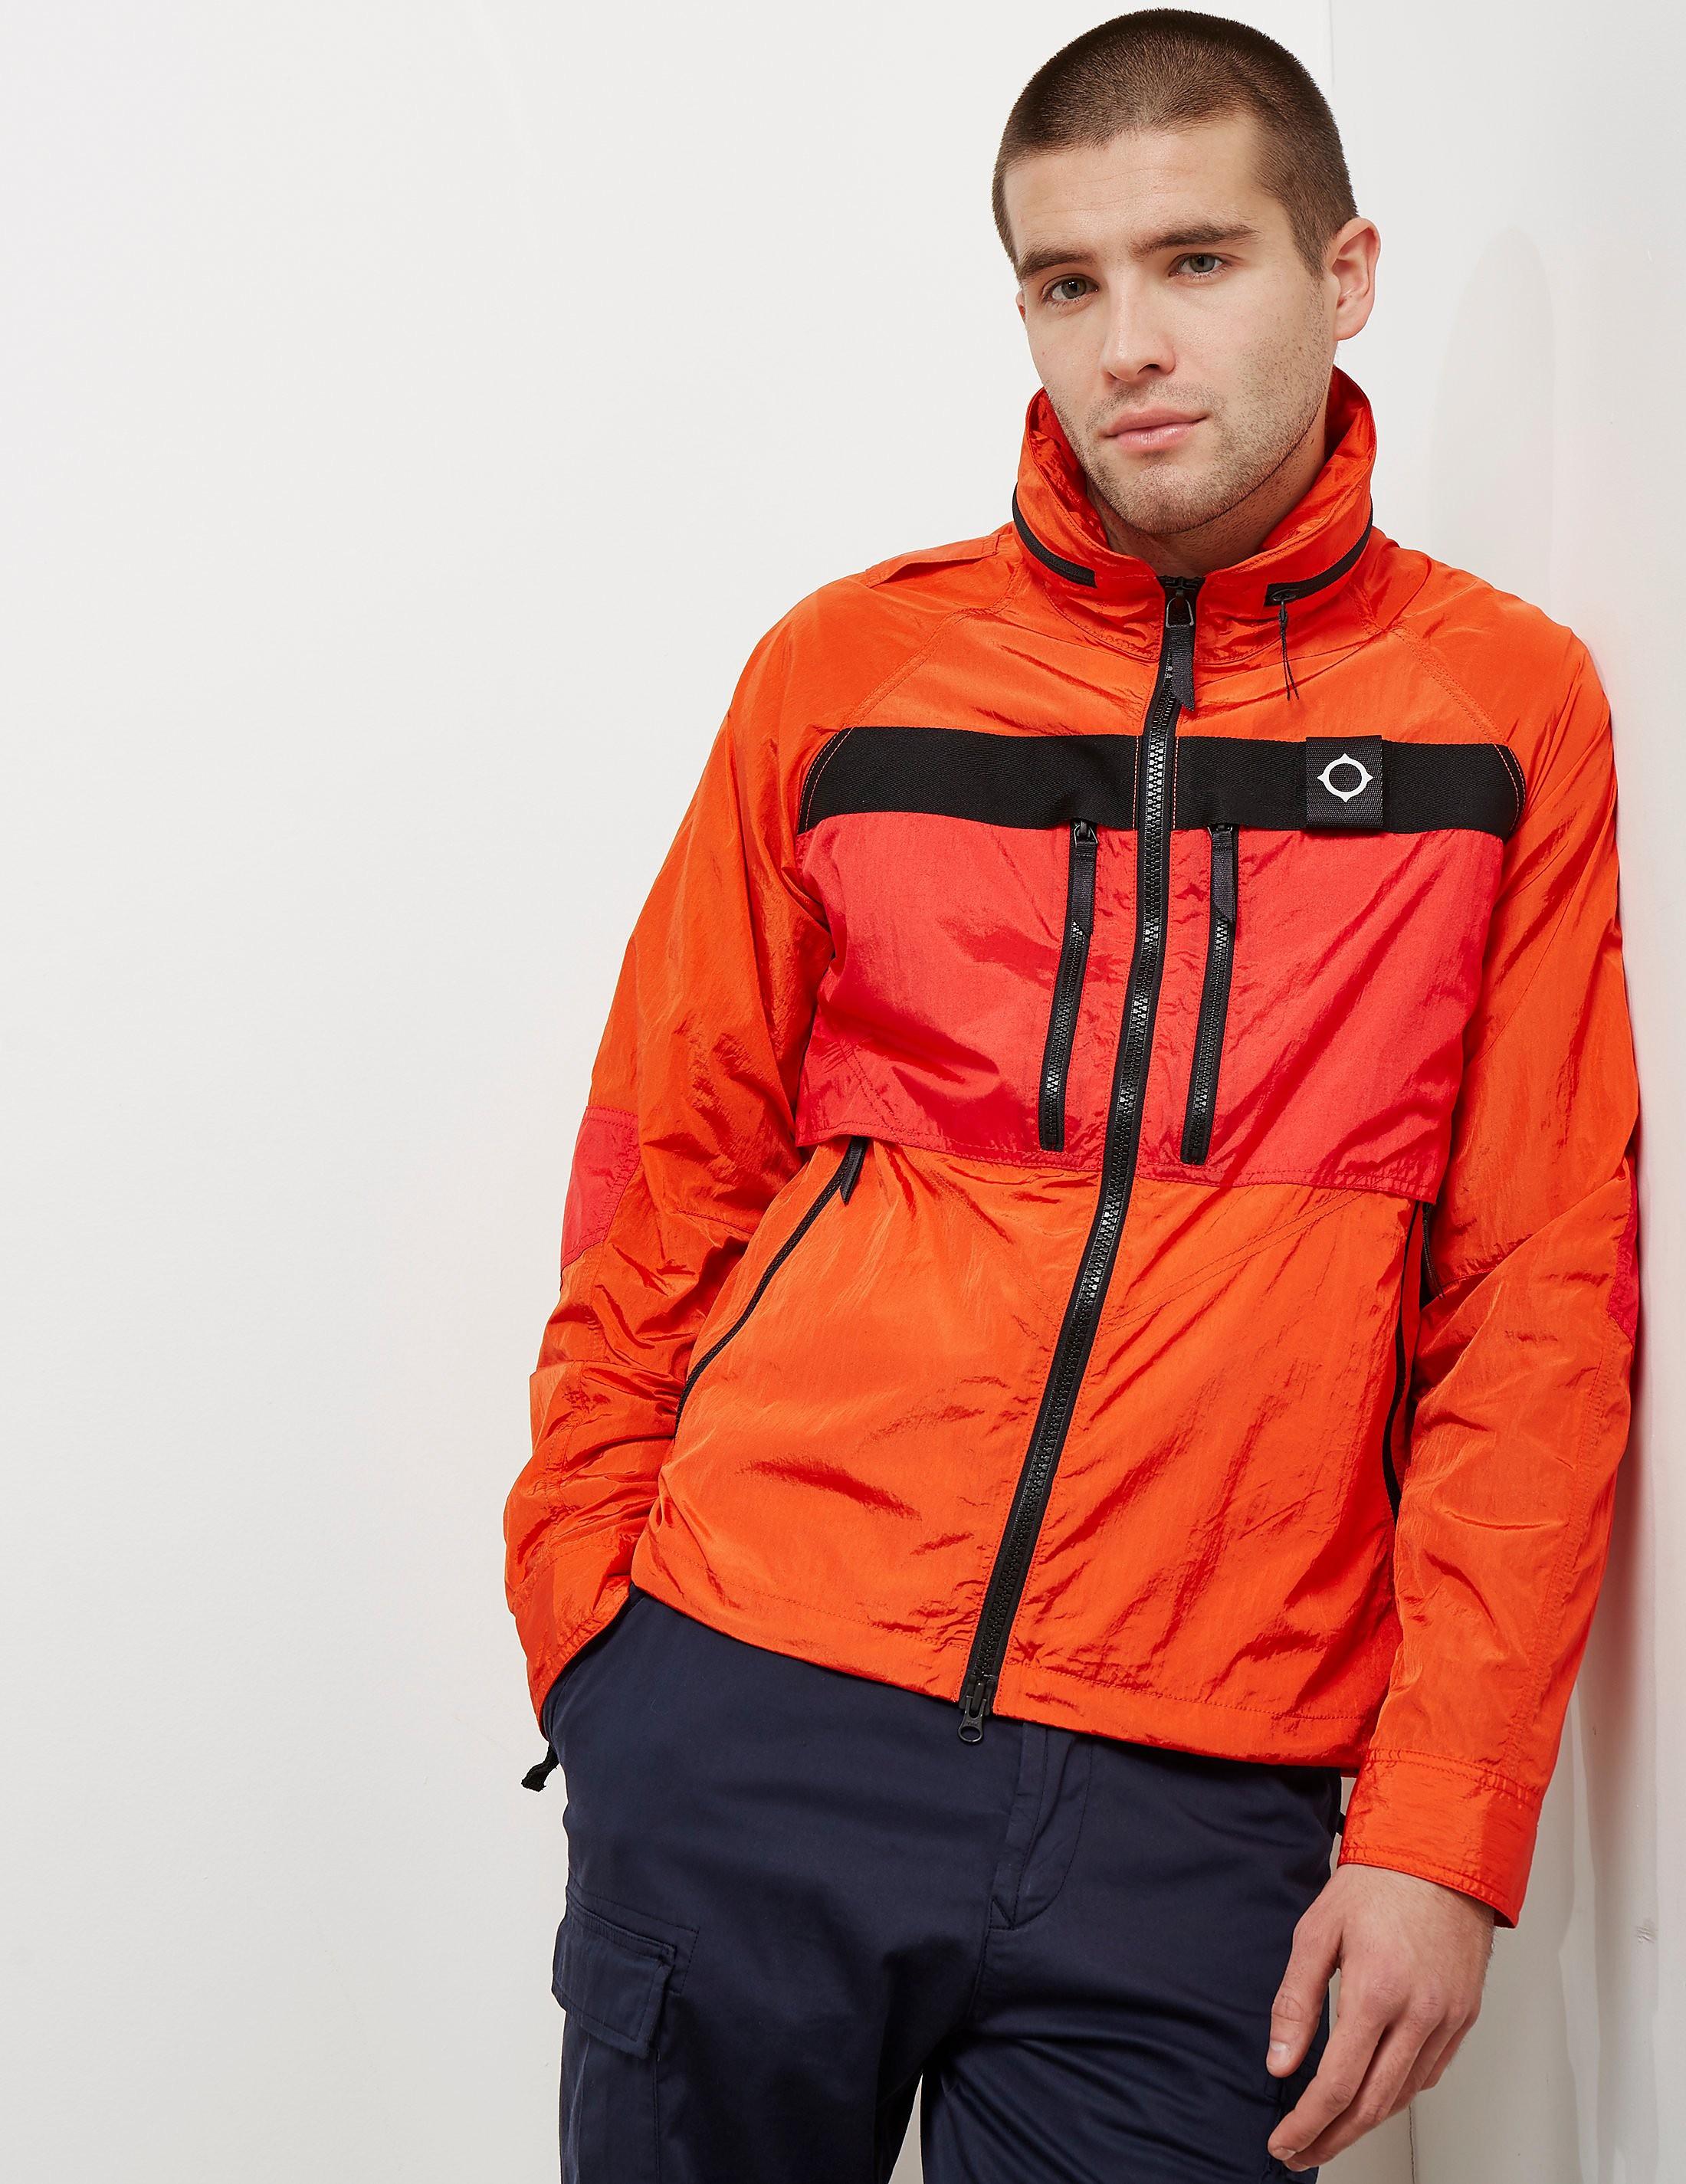 MA STRUM Corvus Nylon Lightweight Jacket